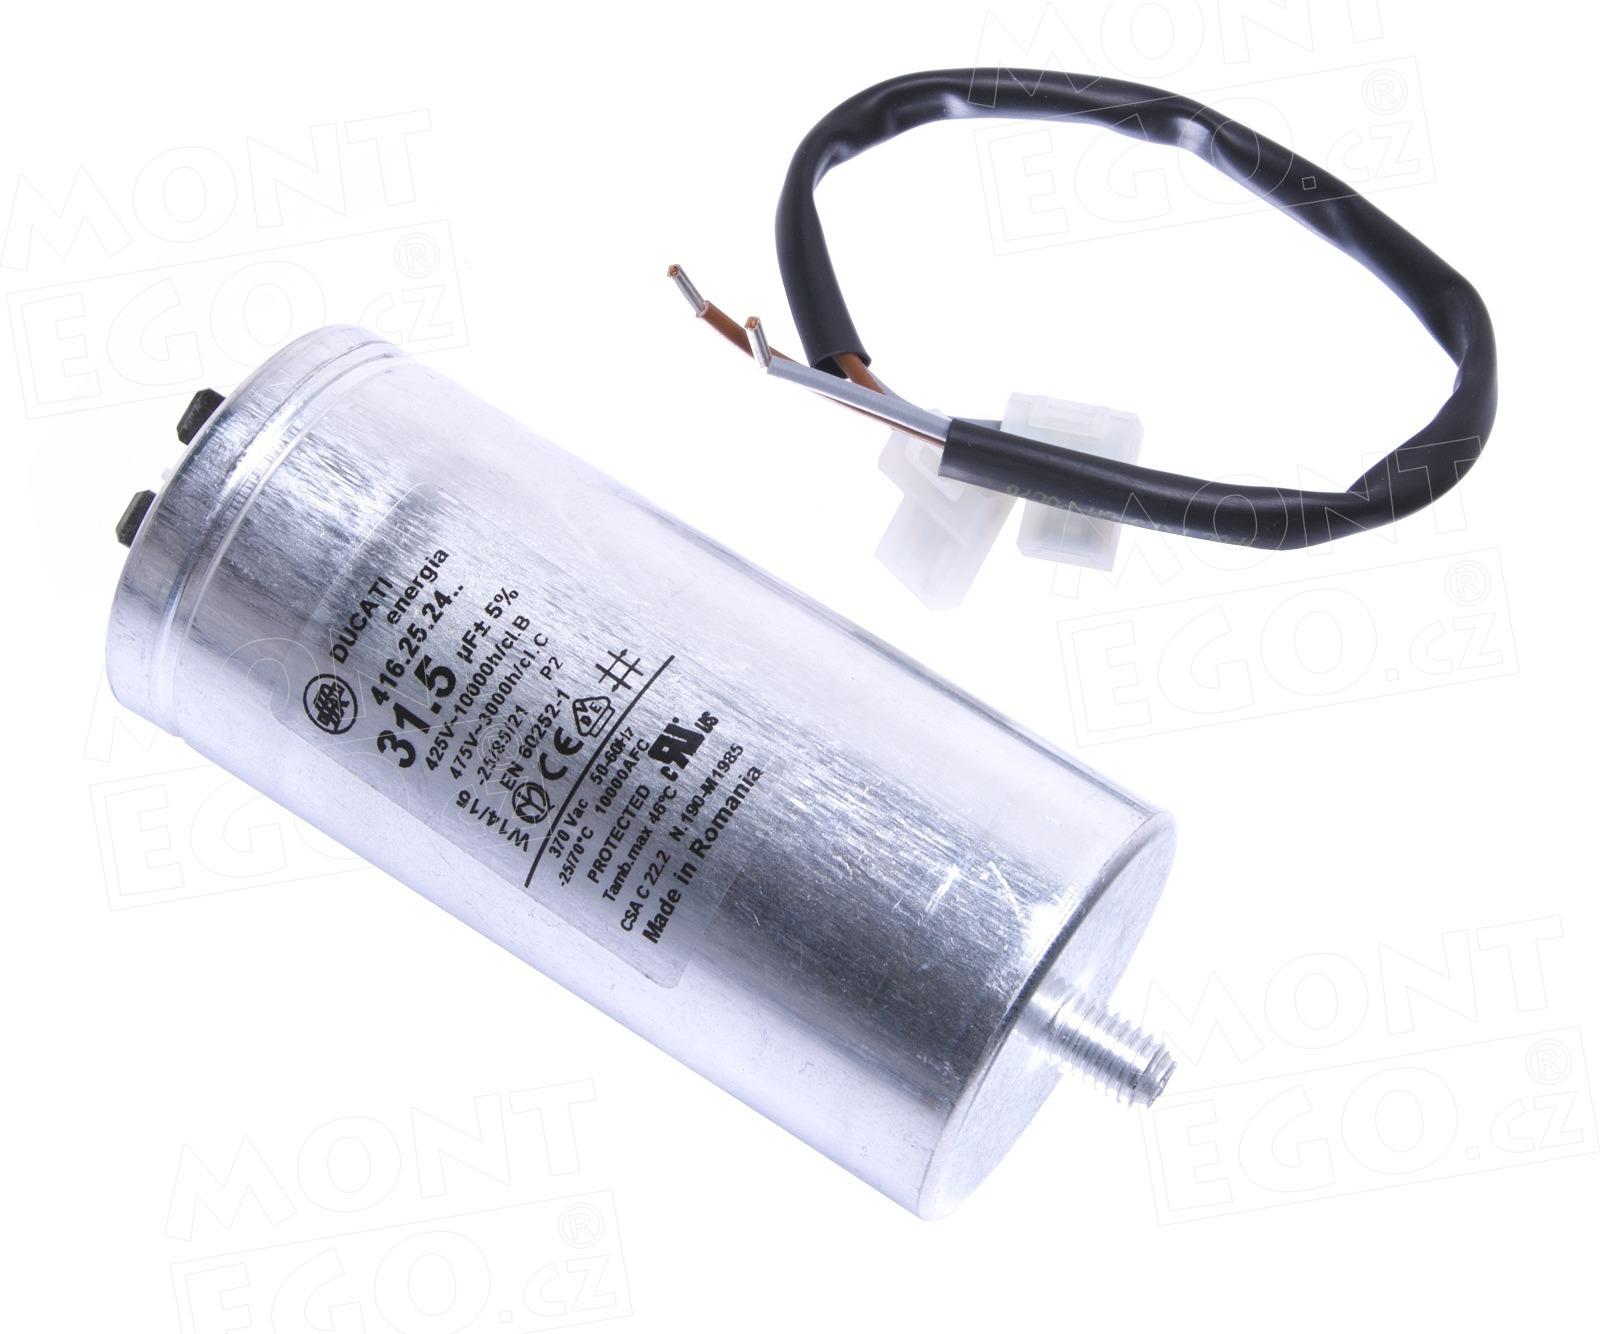 Kondenzátor 31,5 uF/450V k pohonu Came BK-1800 119RIR282